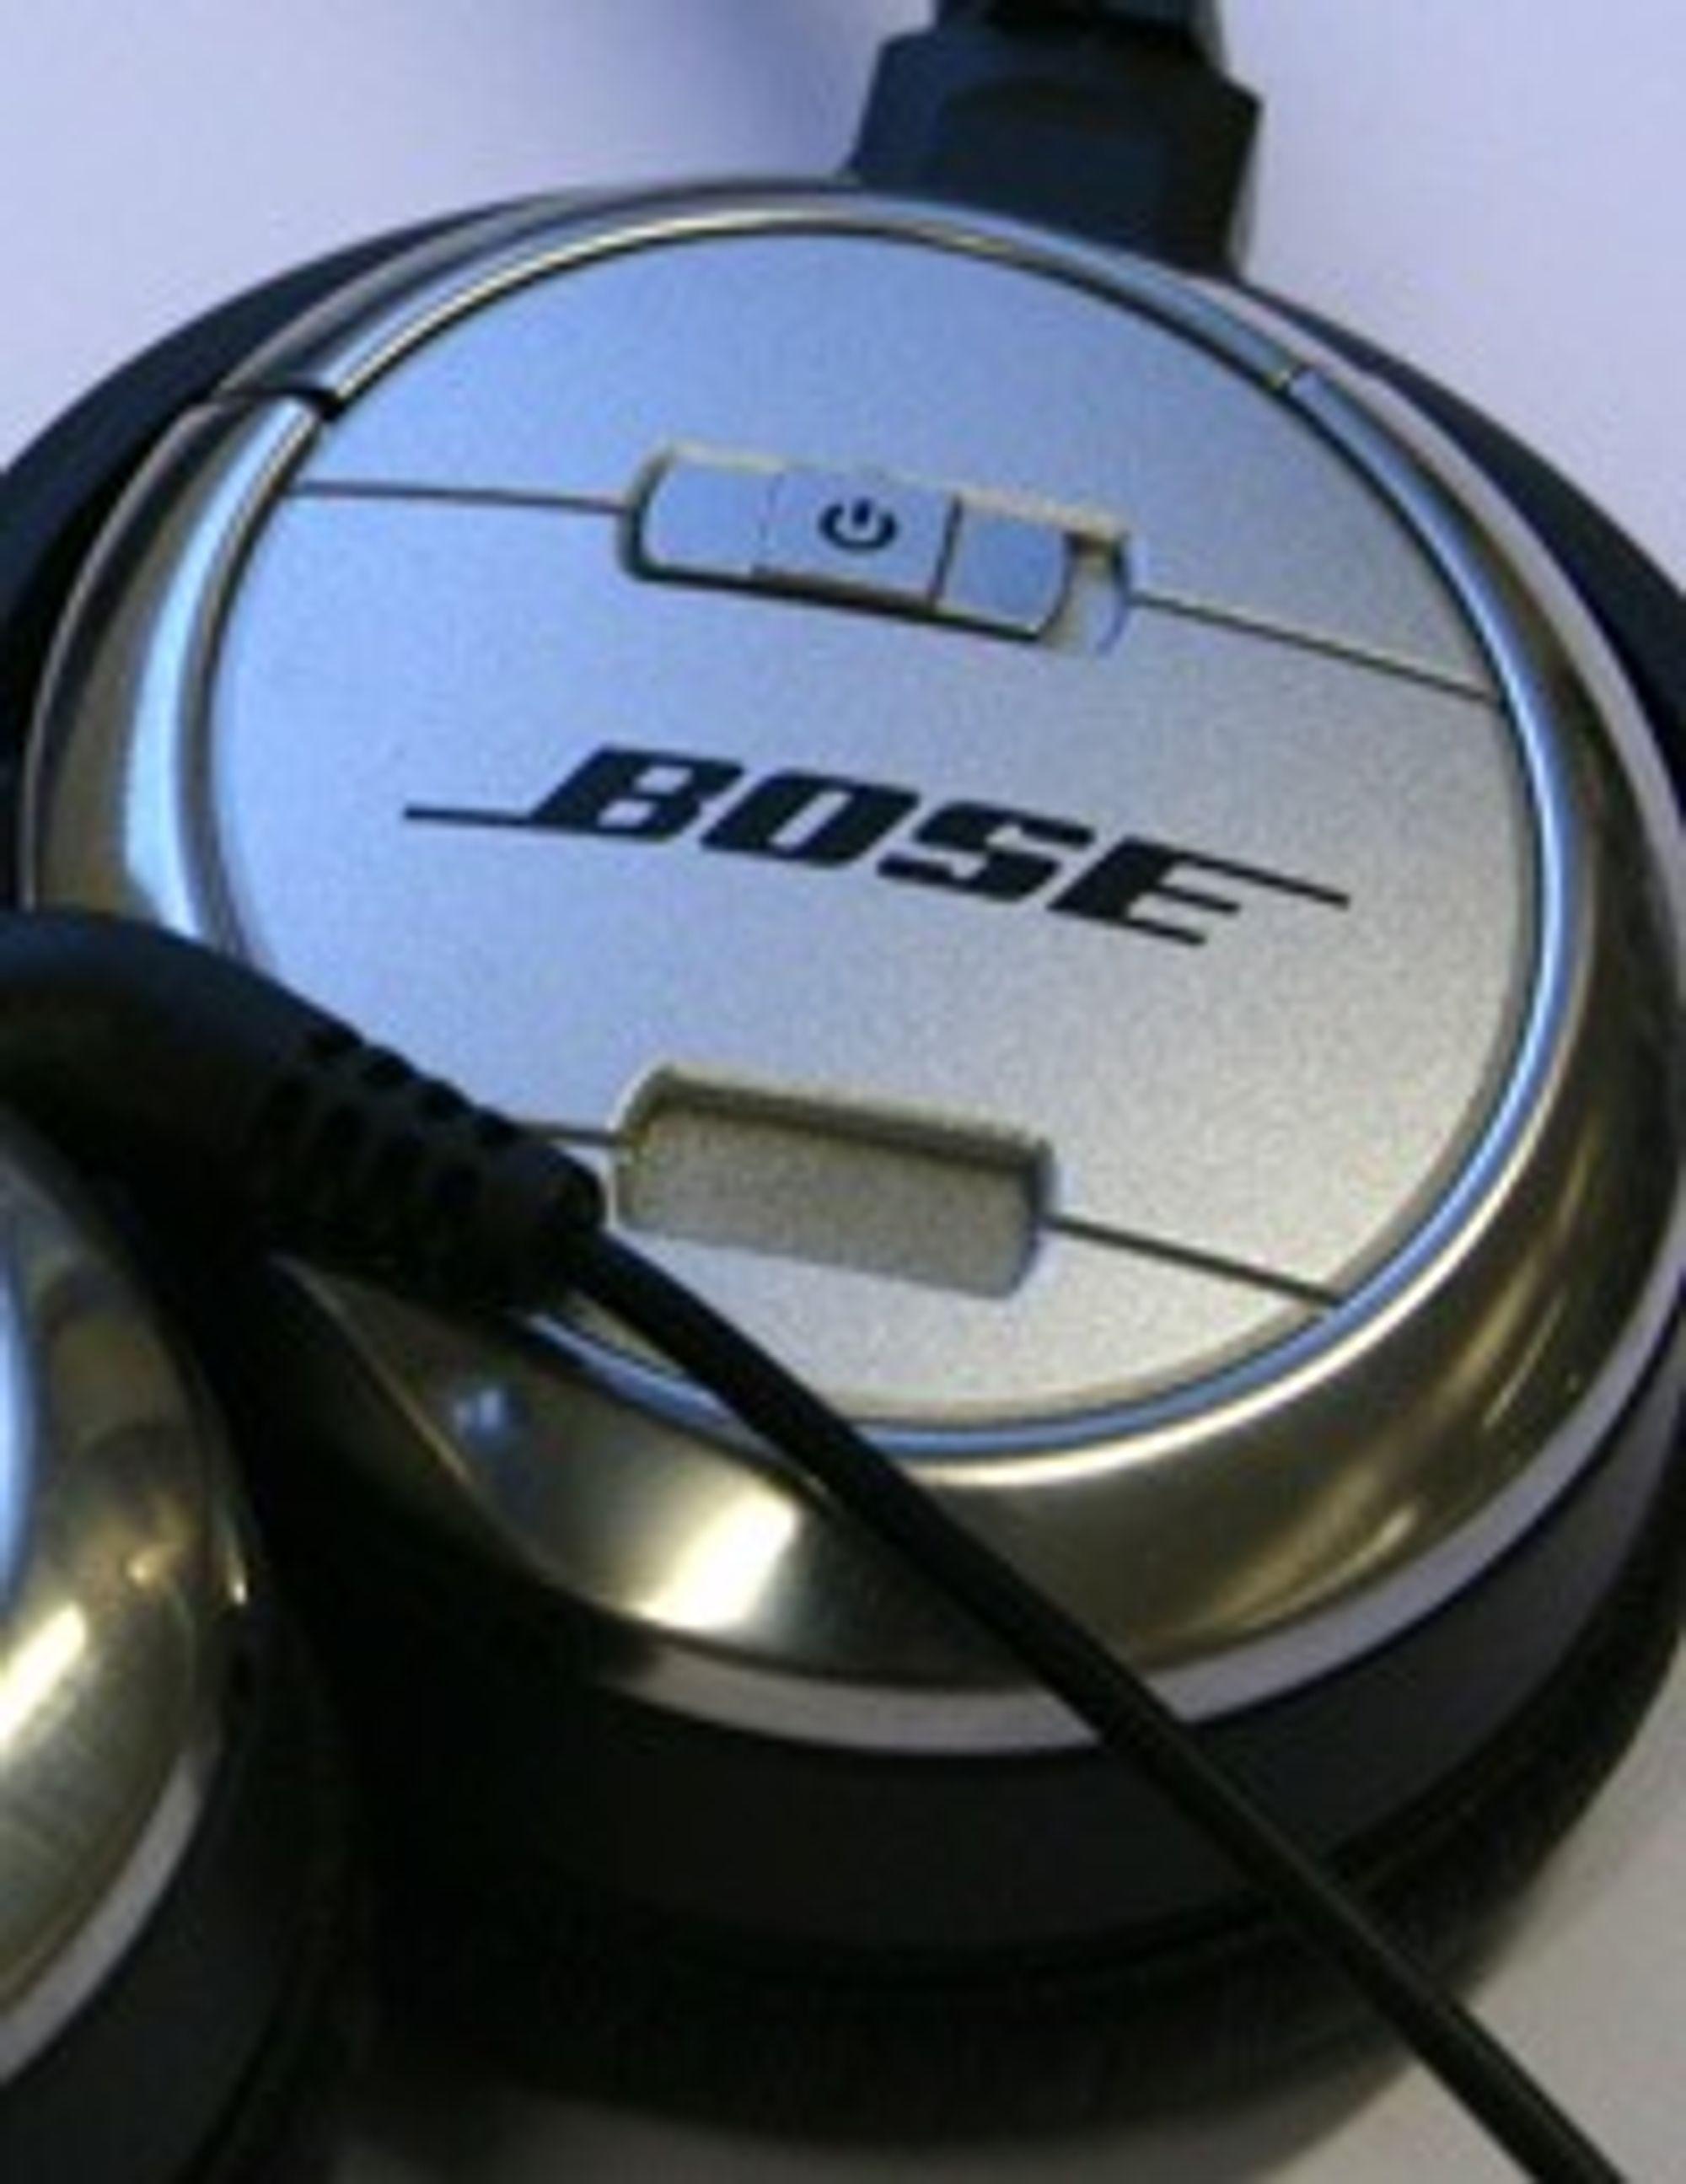 Bose QuietComfort 3: Dyr stillhet Tu.no